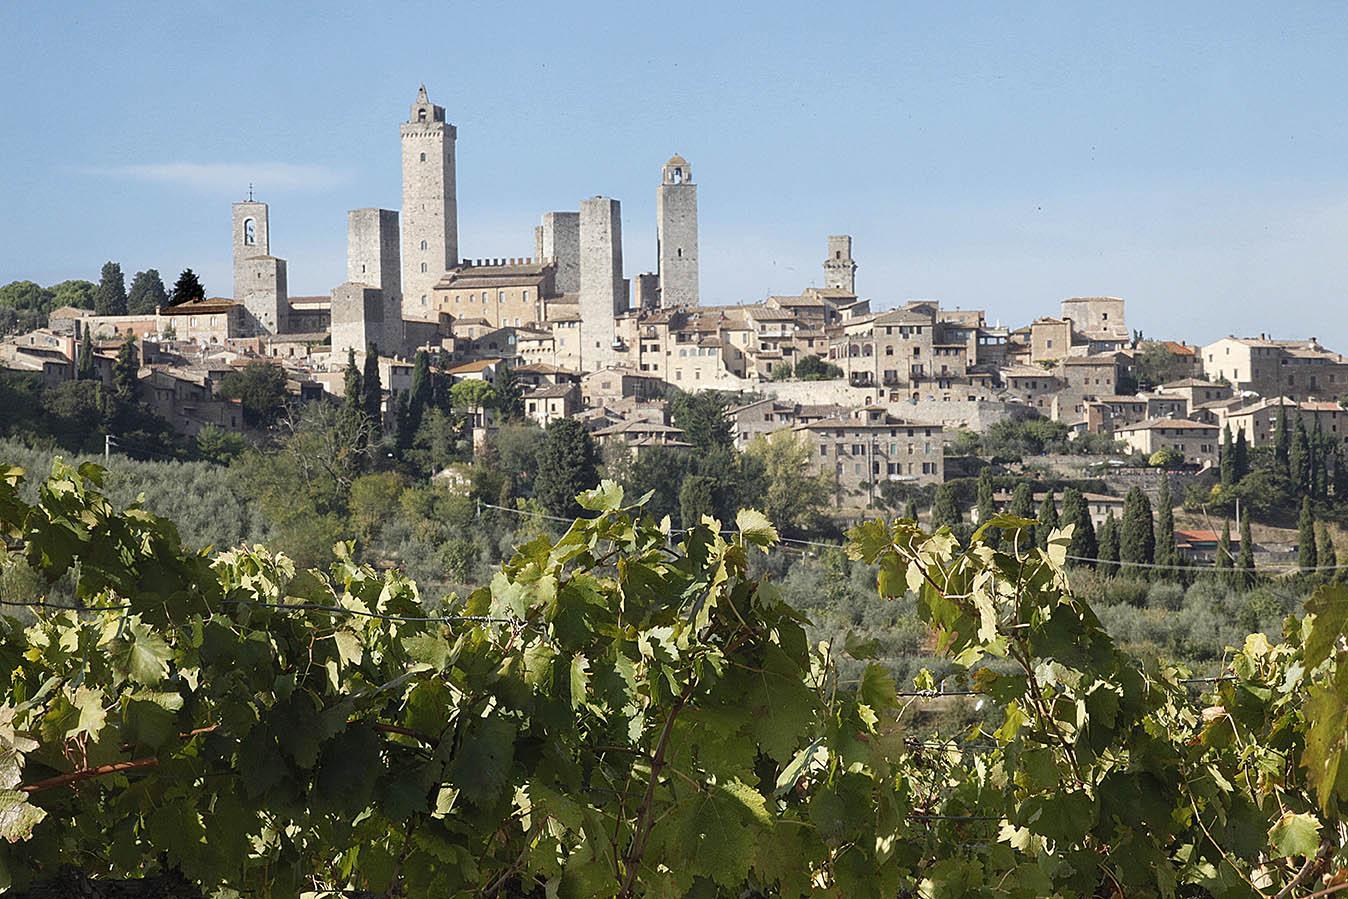 San Gimignano, Via Francigena